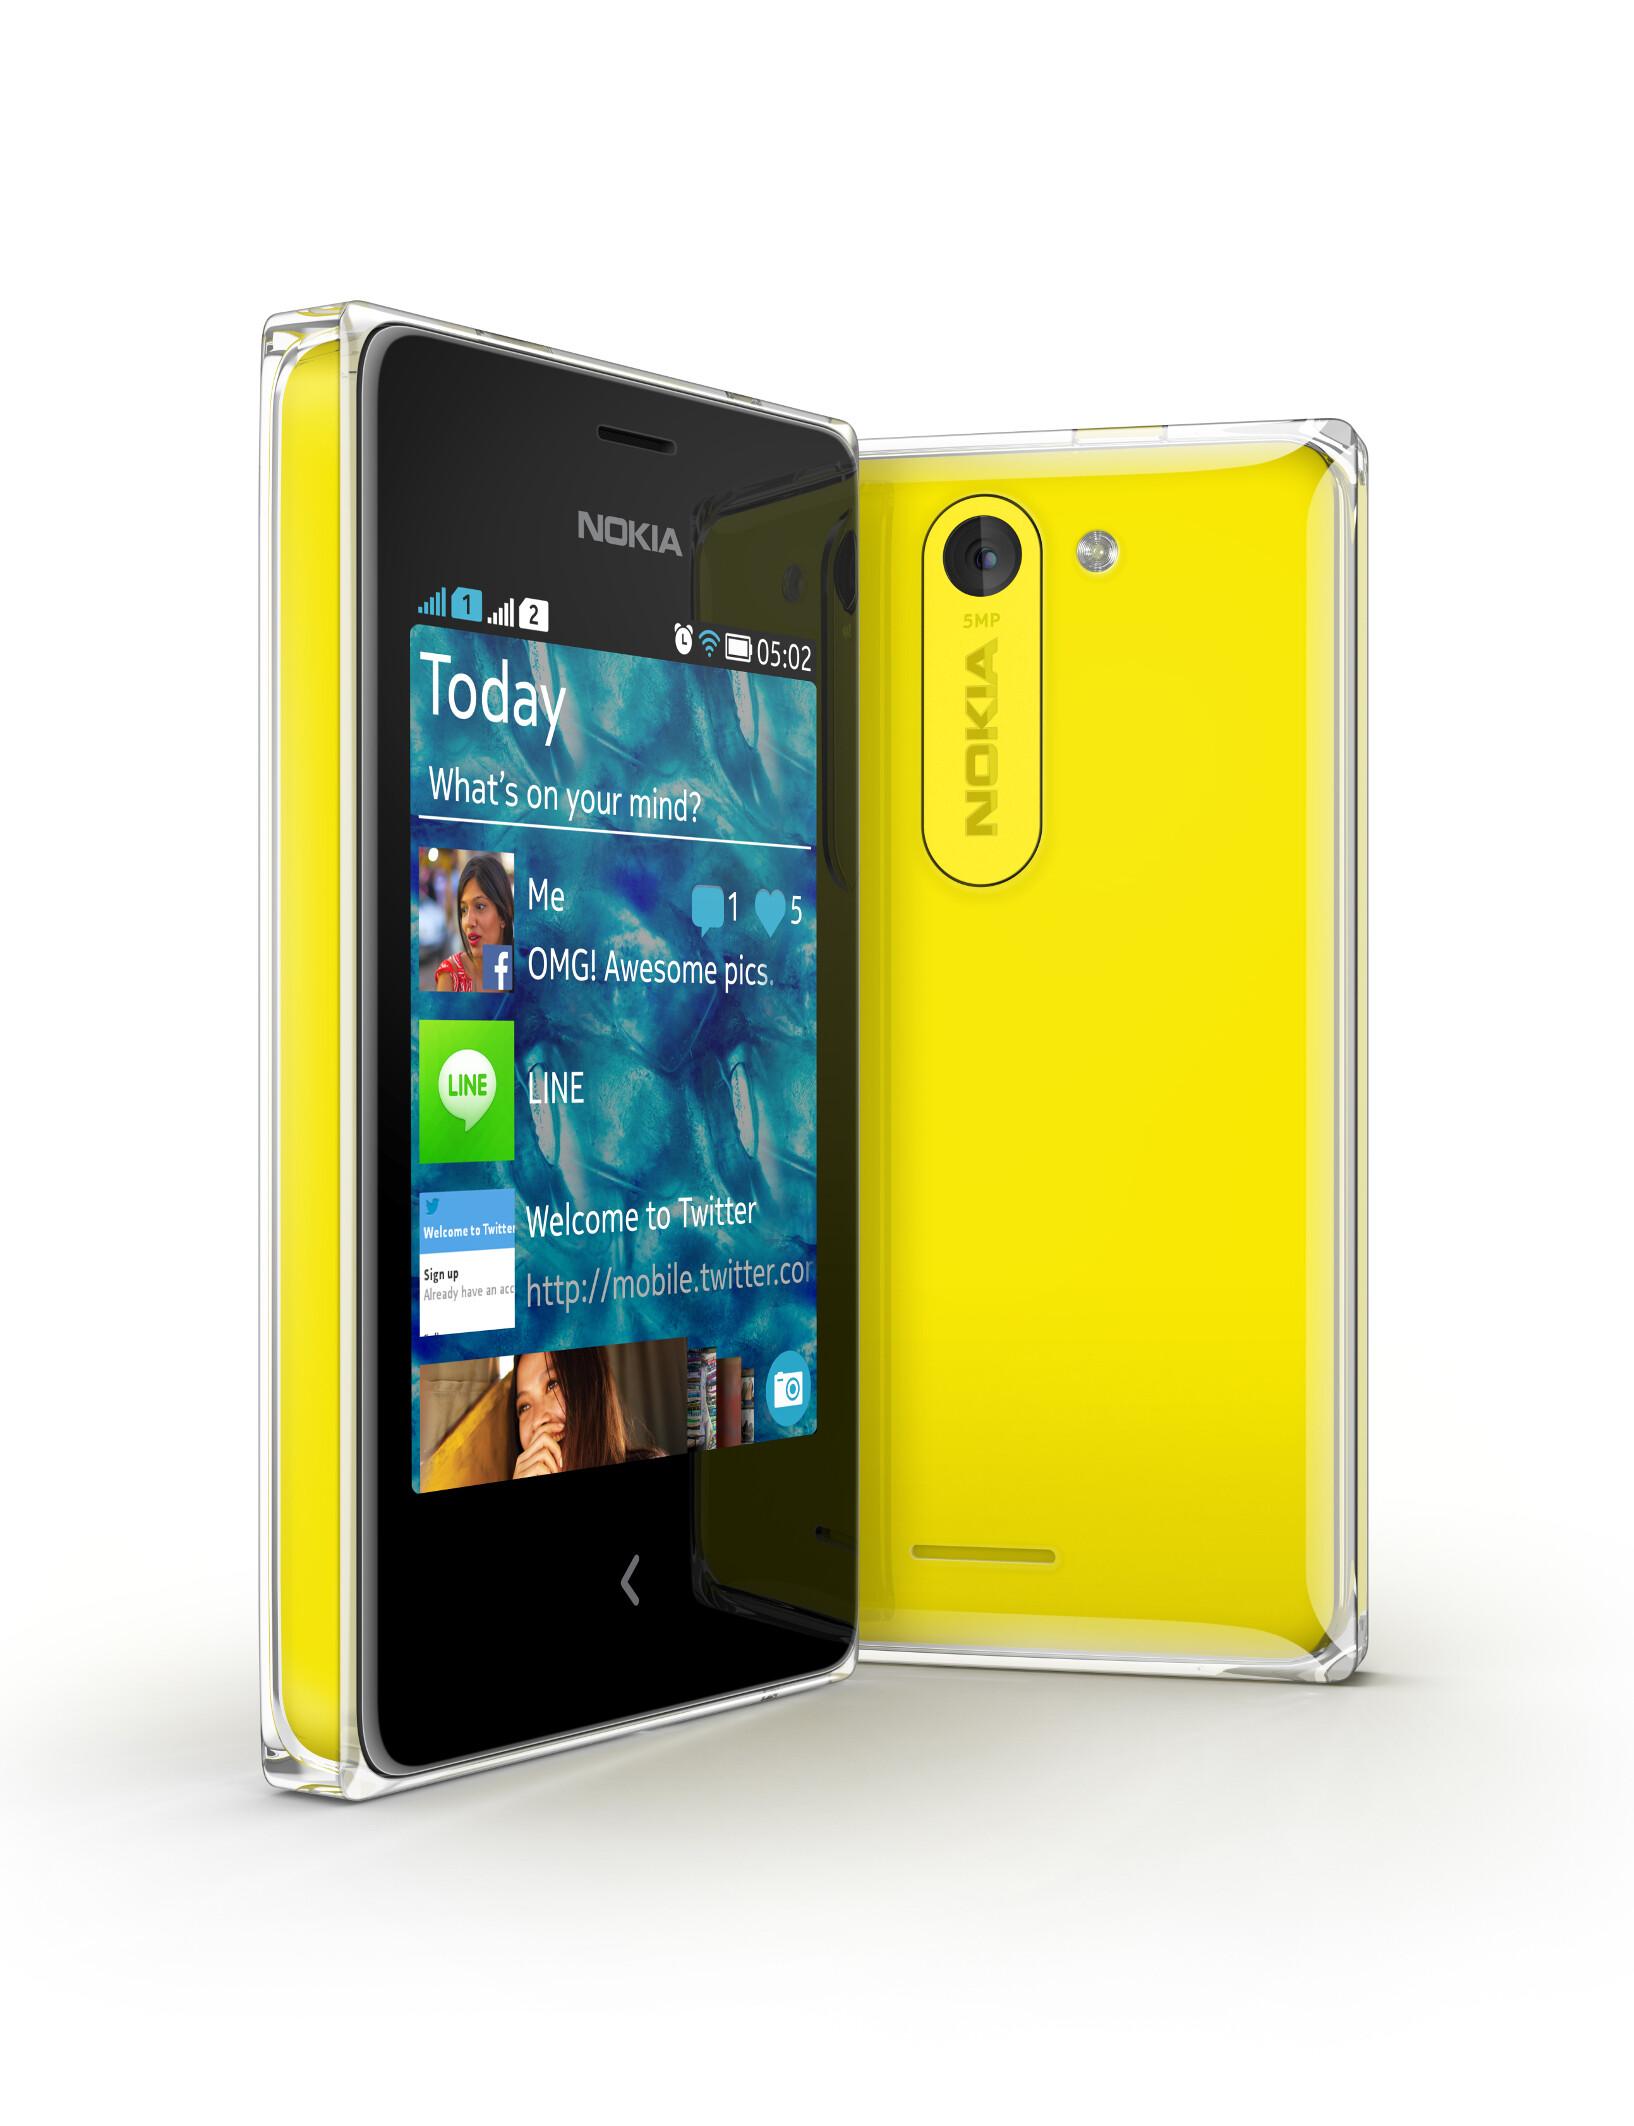 Nokia asha 502 price in bangalore dating  Nokia asha 502 ...